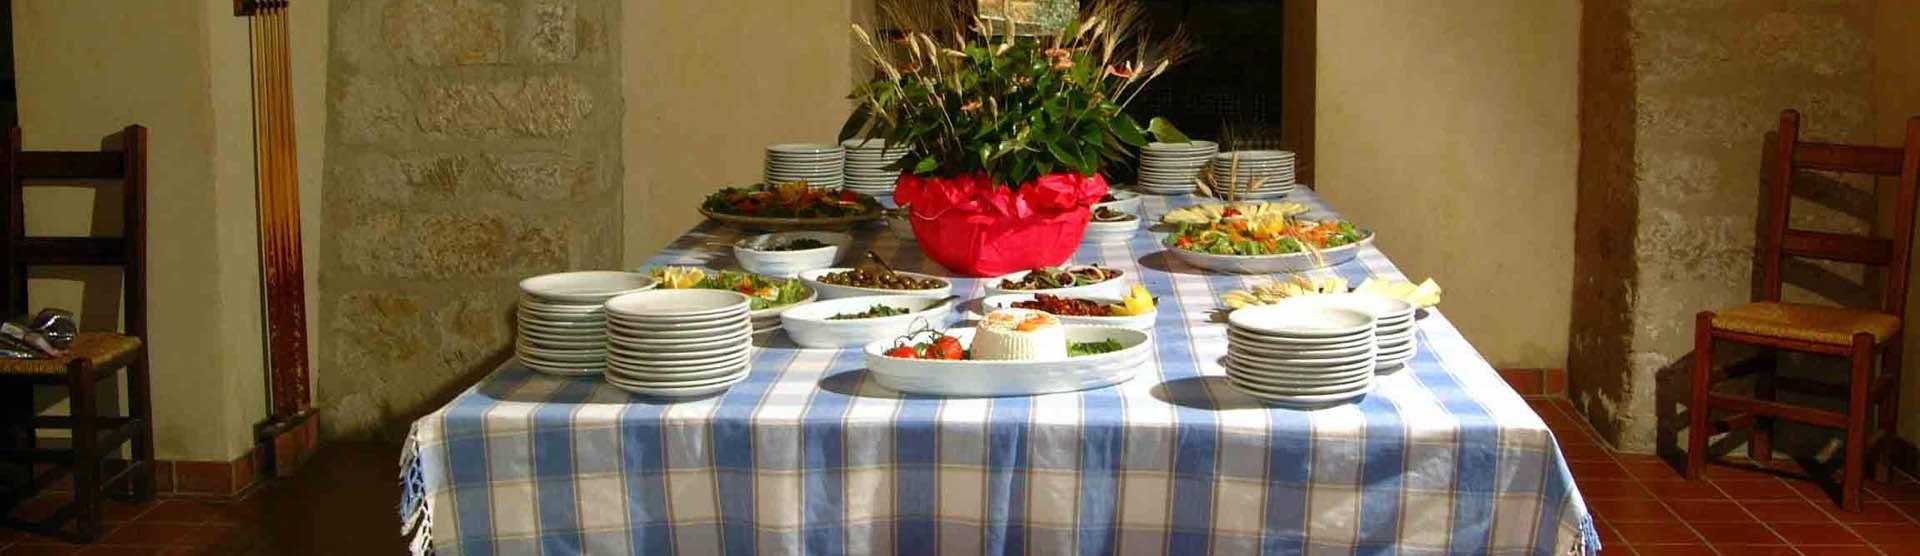 menu pranzo 25 aprile agriturismo madonie sicilia